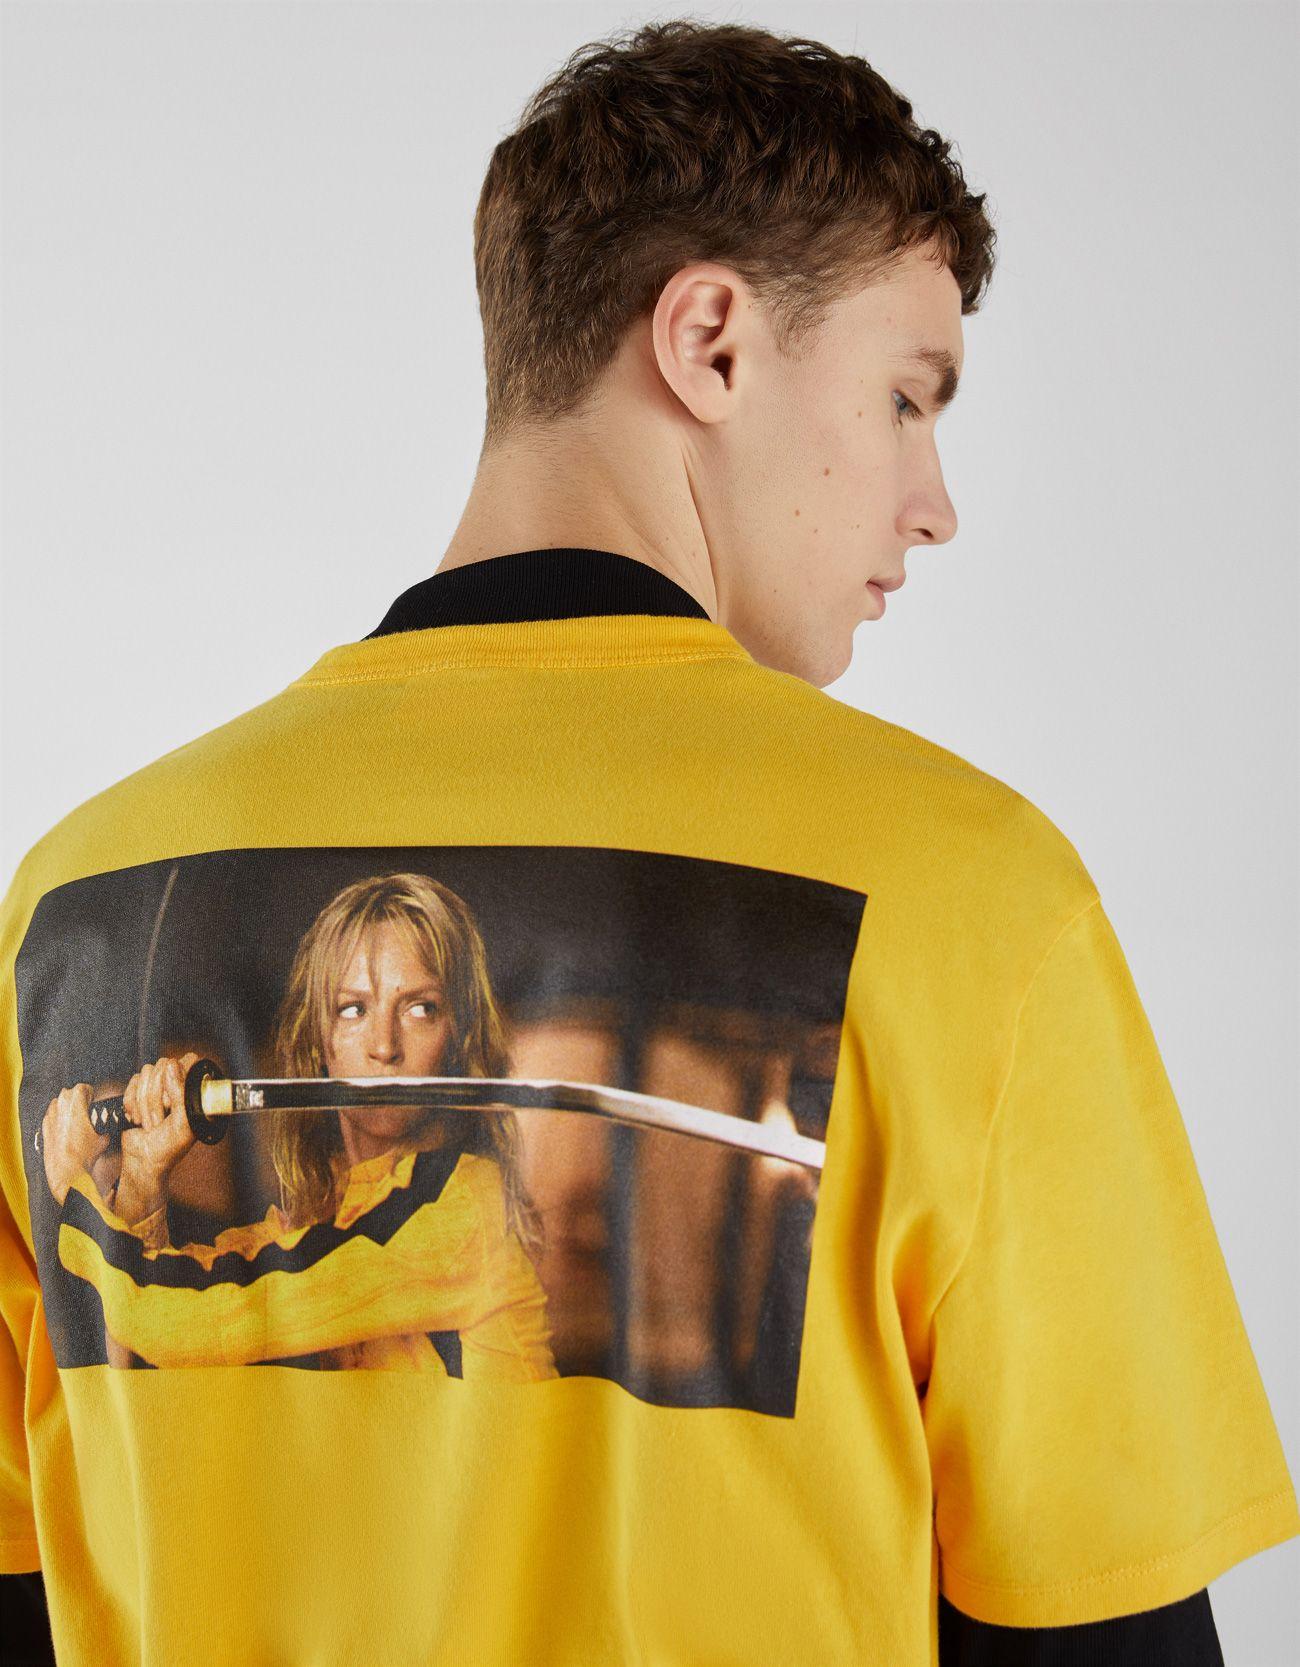 elegir oficial marca popular modelos de gran variedad Camiseta Kill Bill en 2019 | Camisetas, Kill bill y ...